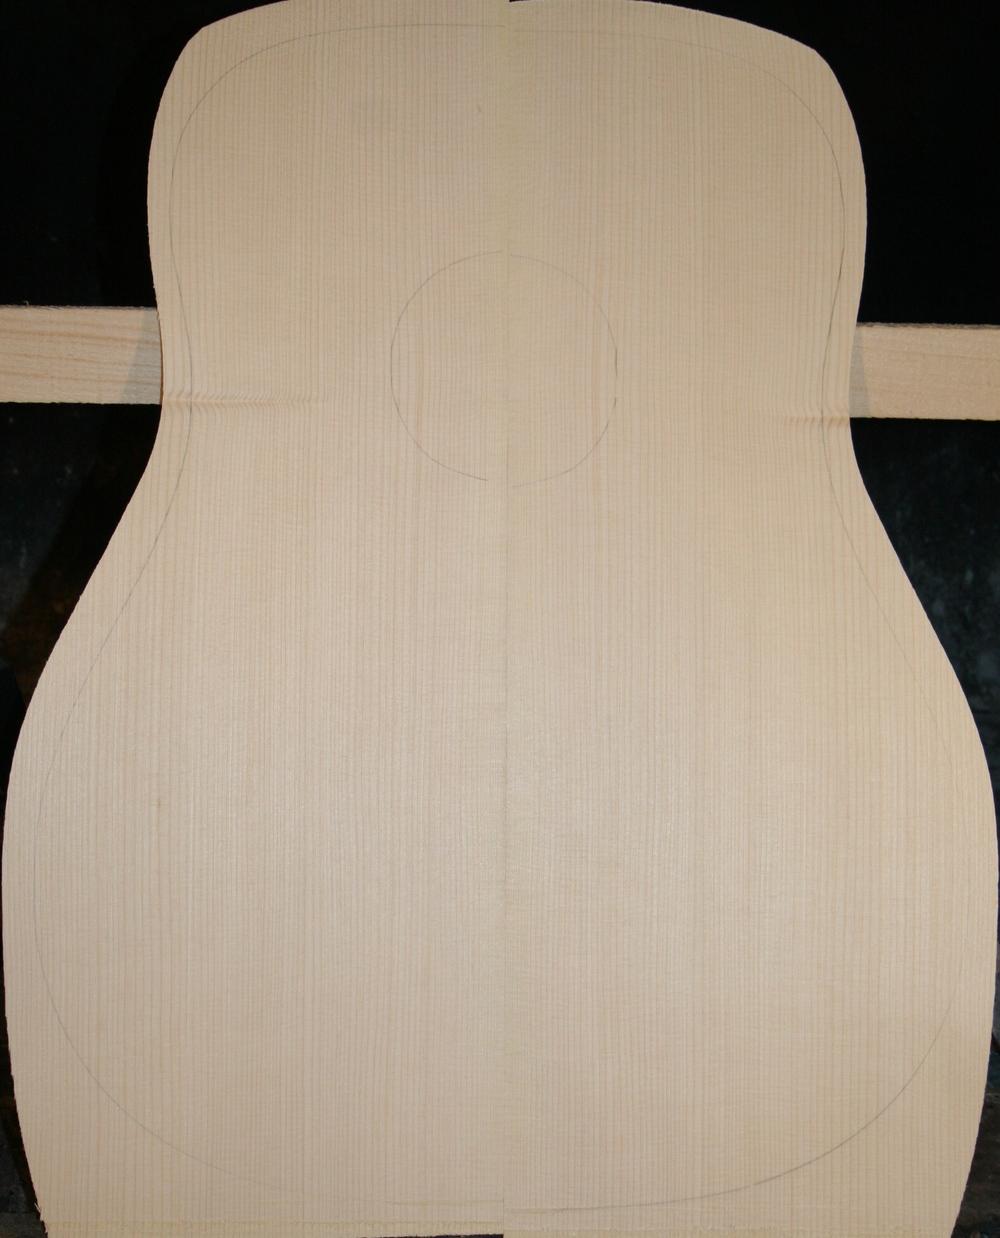 $85 Guitar Top